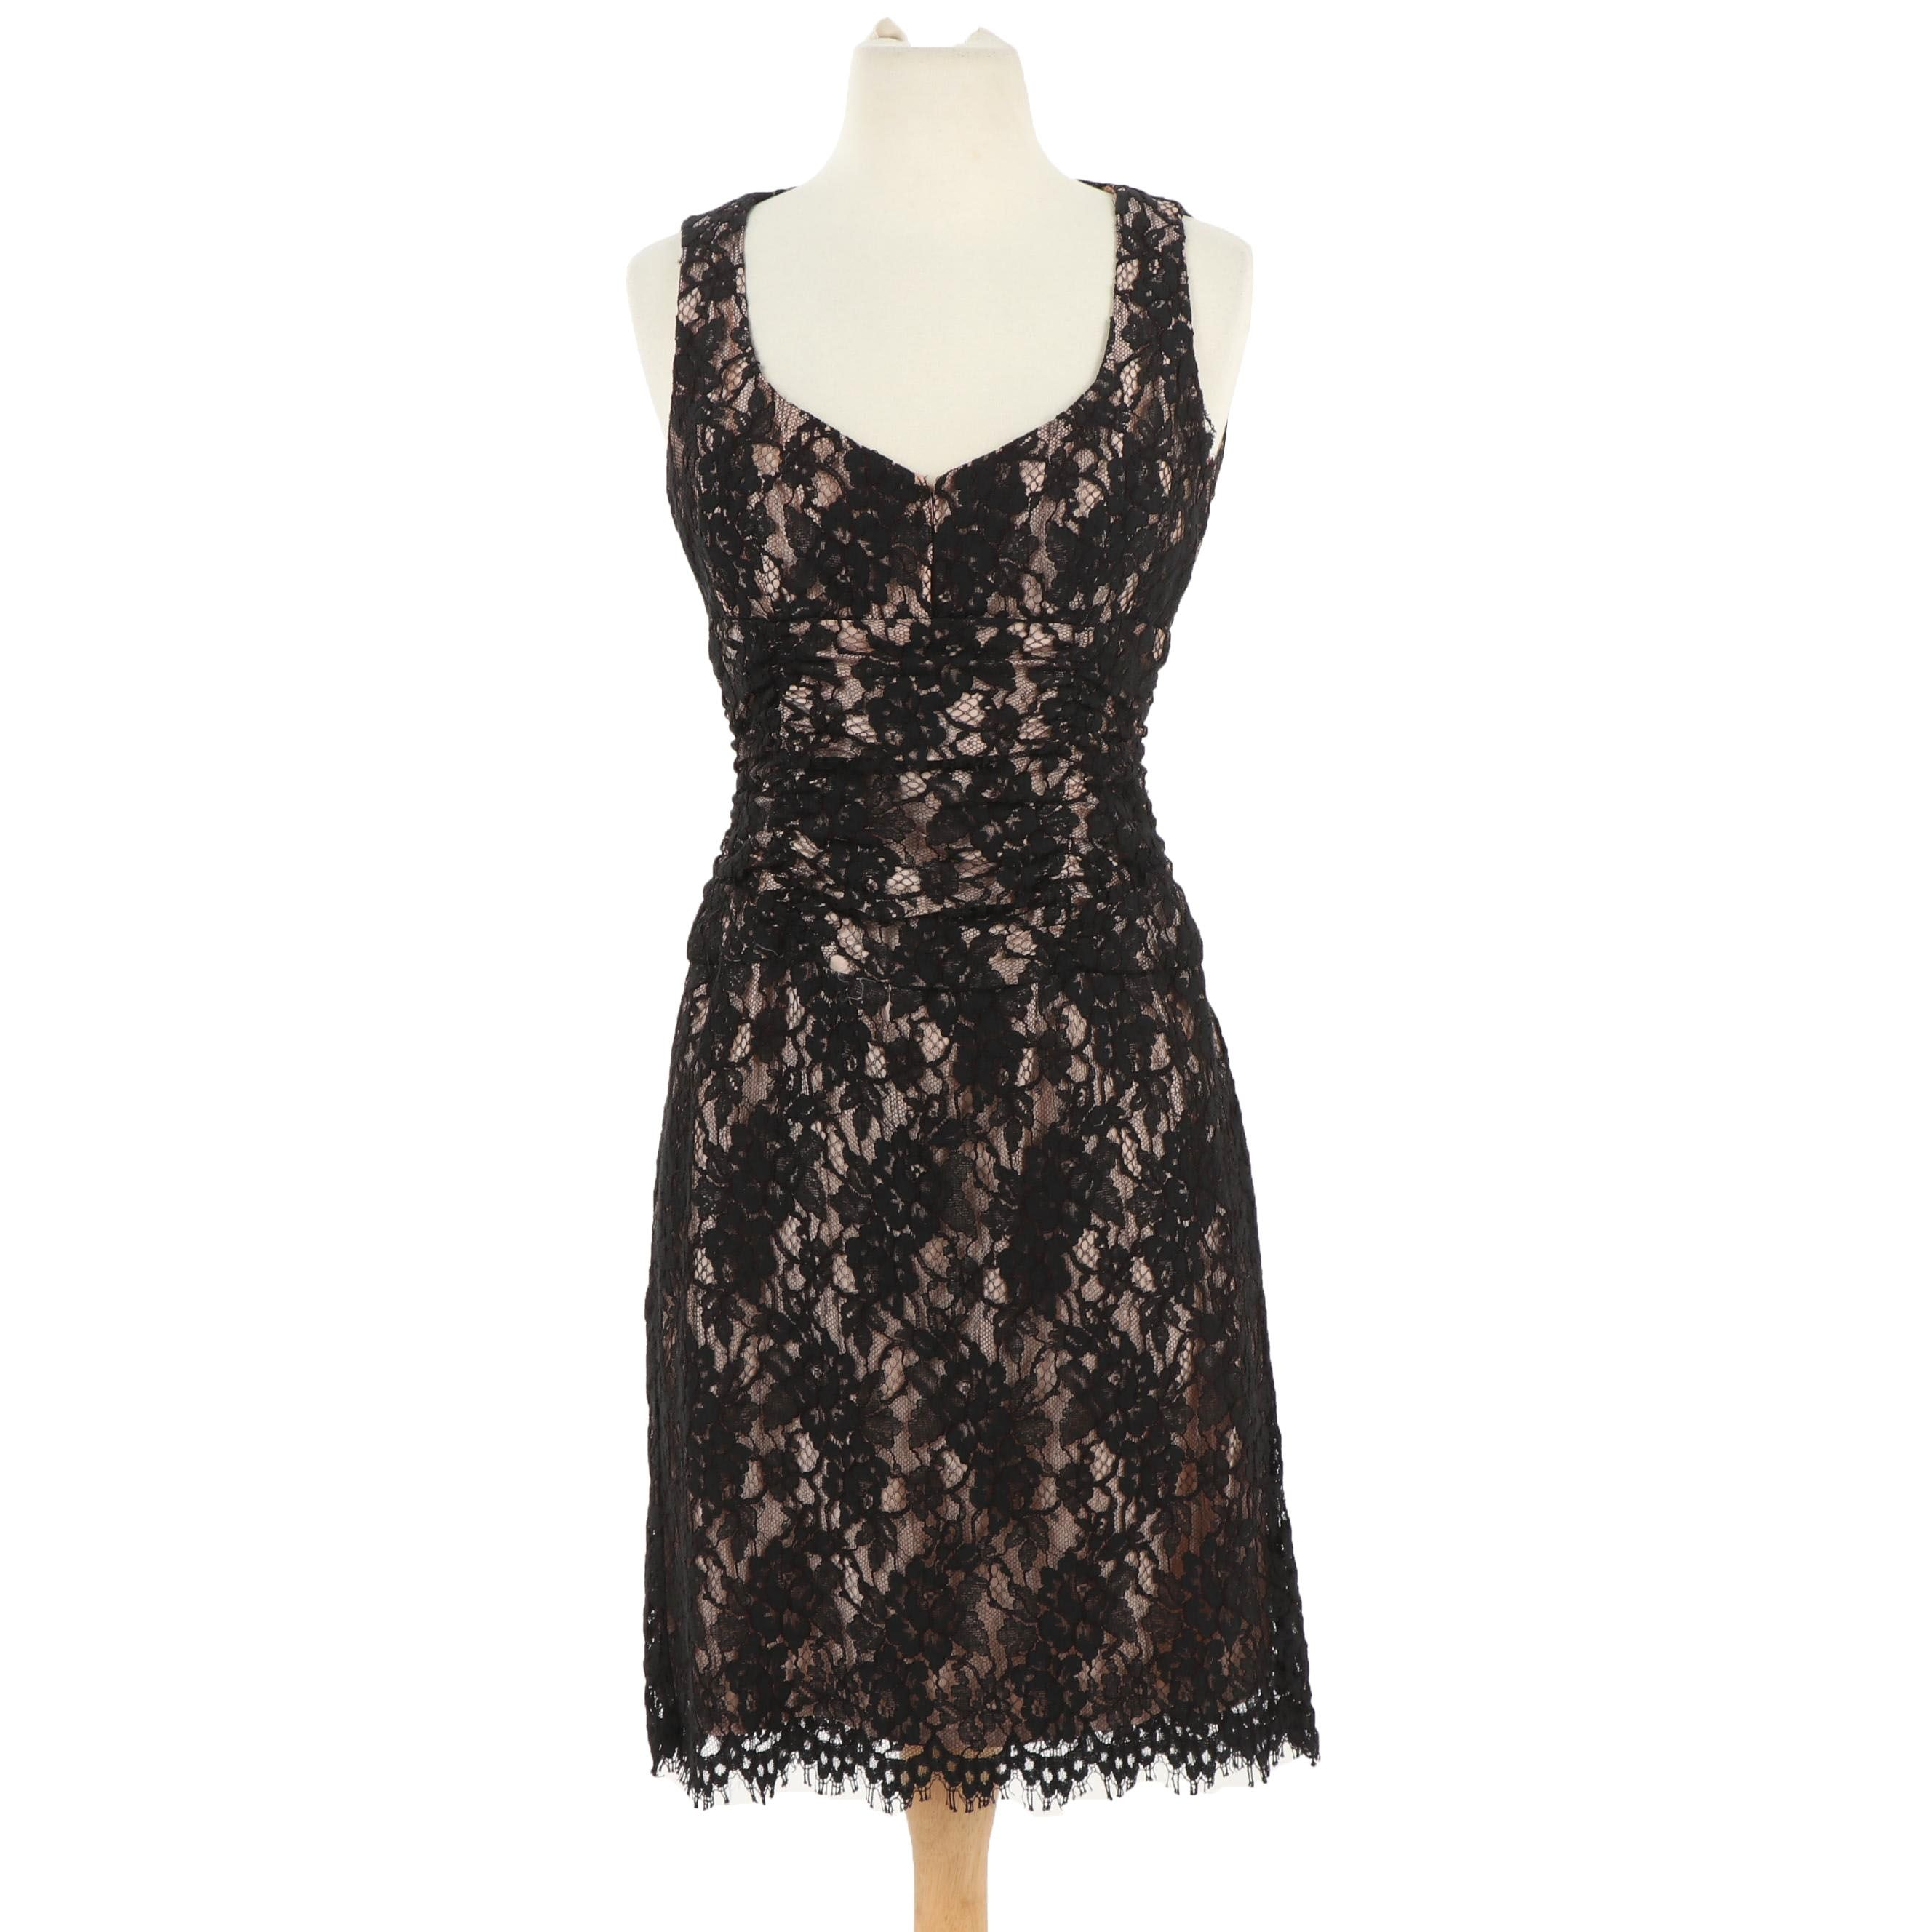 Nanette Lepore Black Lace Sleeveless Cocktail Dress